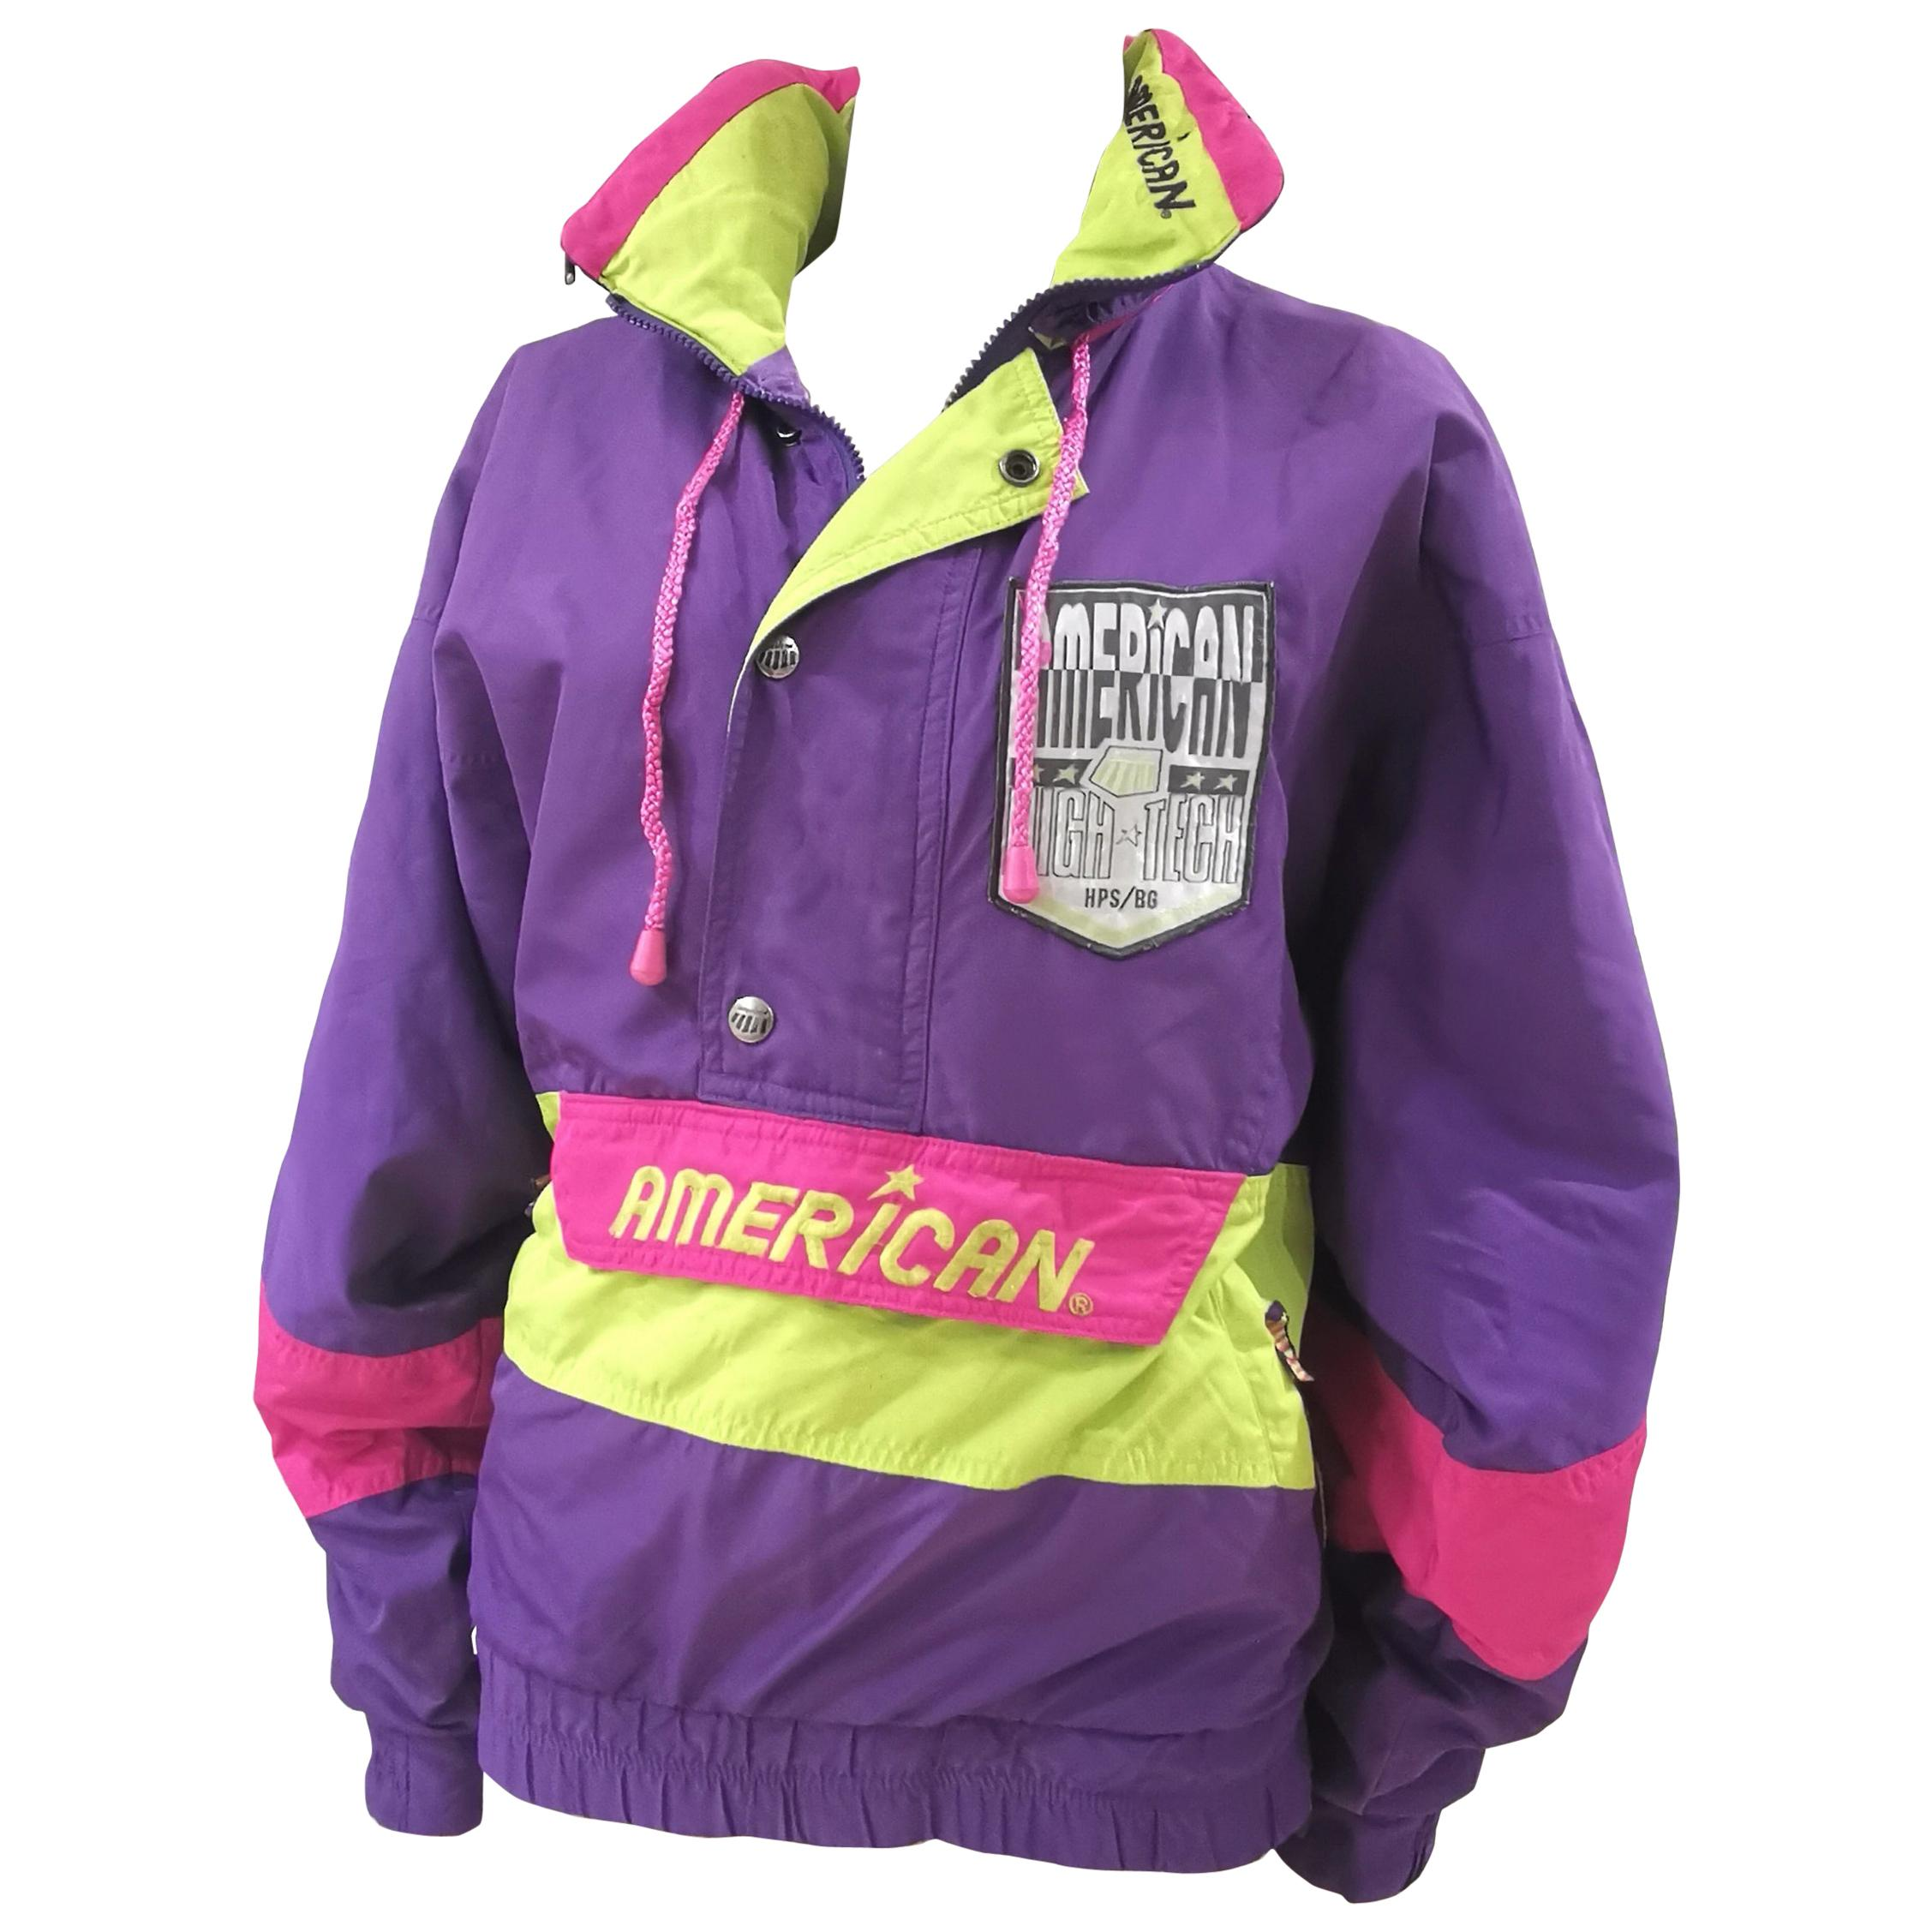 American multicoloured hoodie sweater